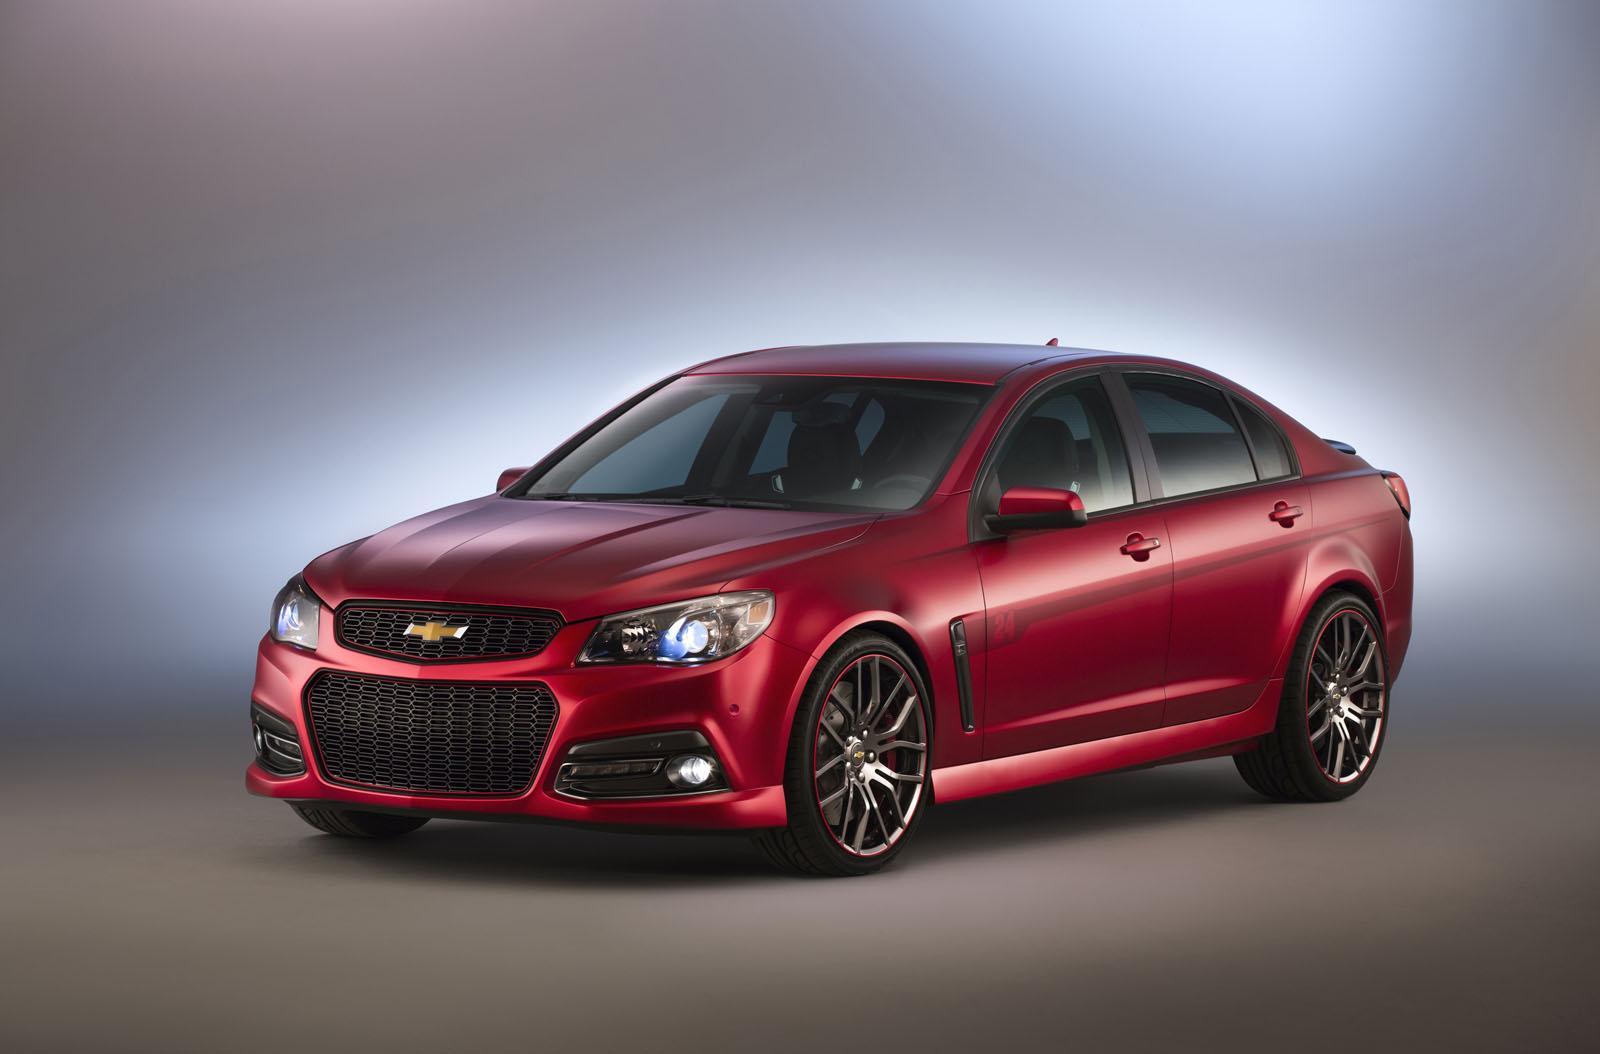 Jeff Gordon Chevrolet >> Chevrolet Cars - News: Commodore-based Gordon SS concept